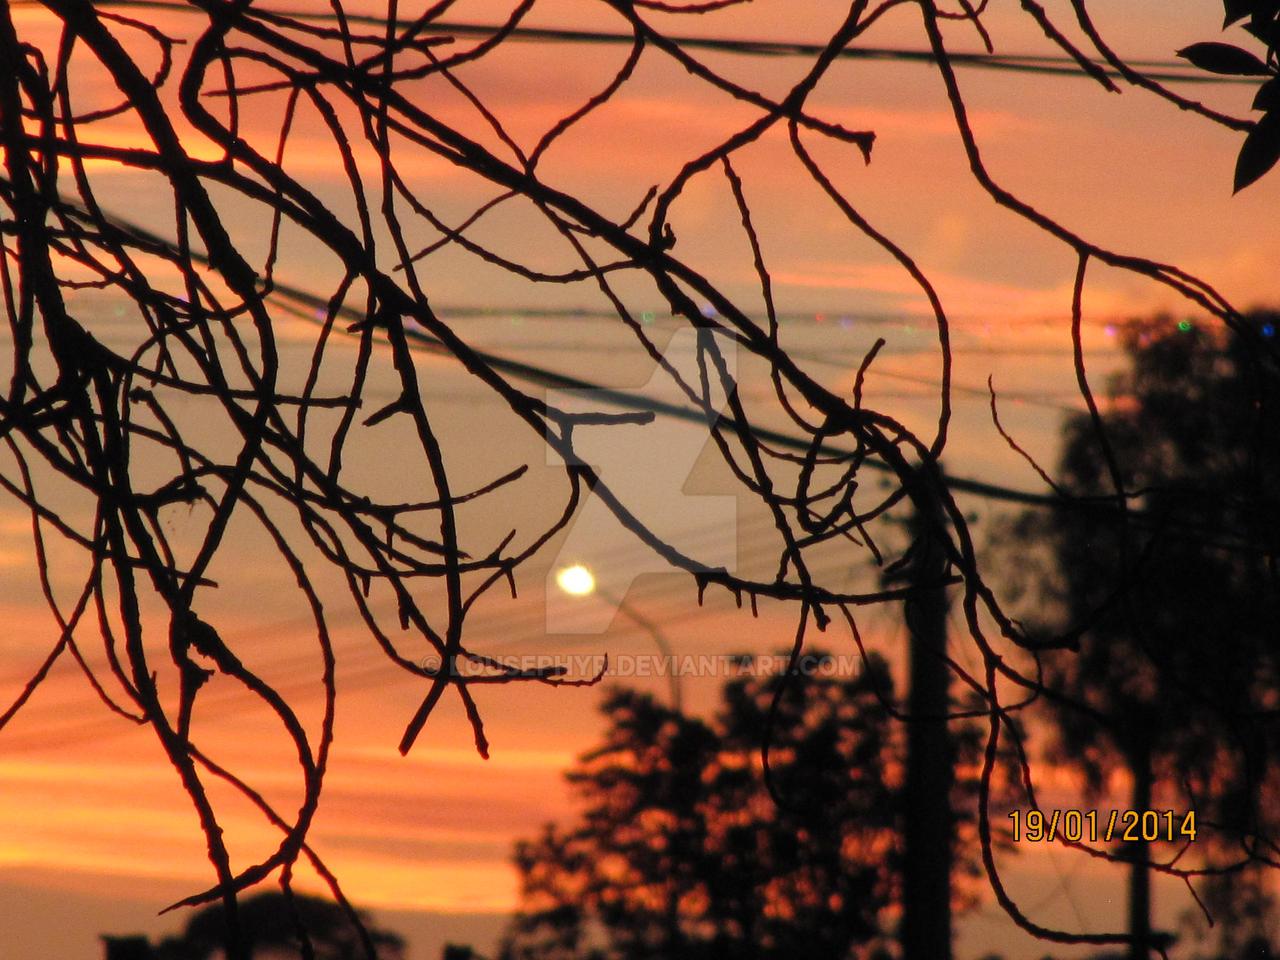 Fiery Sky Thru Trees by lousephyr